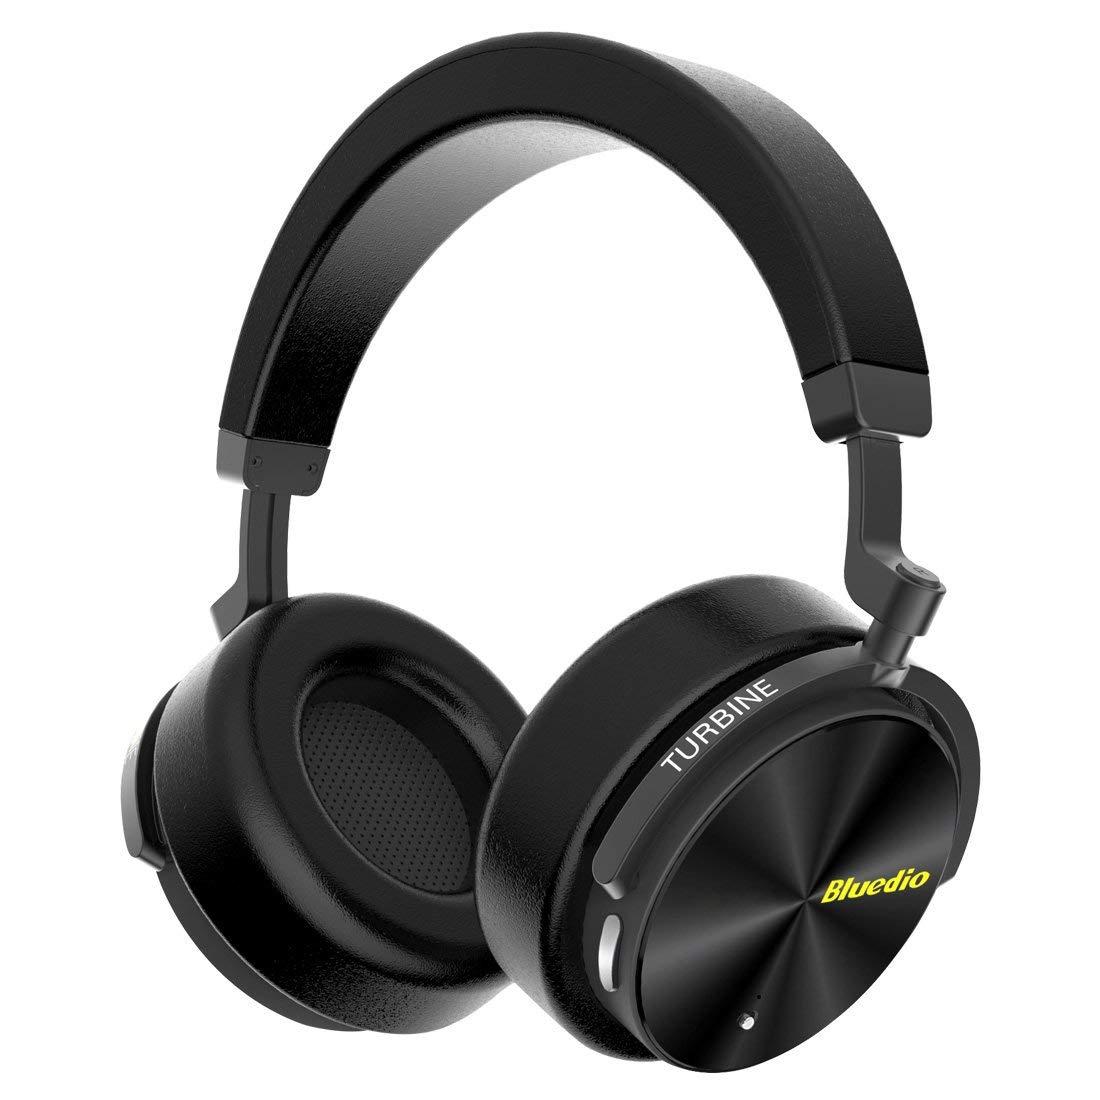 ** Flash Sale ** Bluedio T5 Wireless Bluetooth Headphone with Microphone USB-C! BLACK & YELLOW & RED! @GearBest